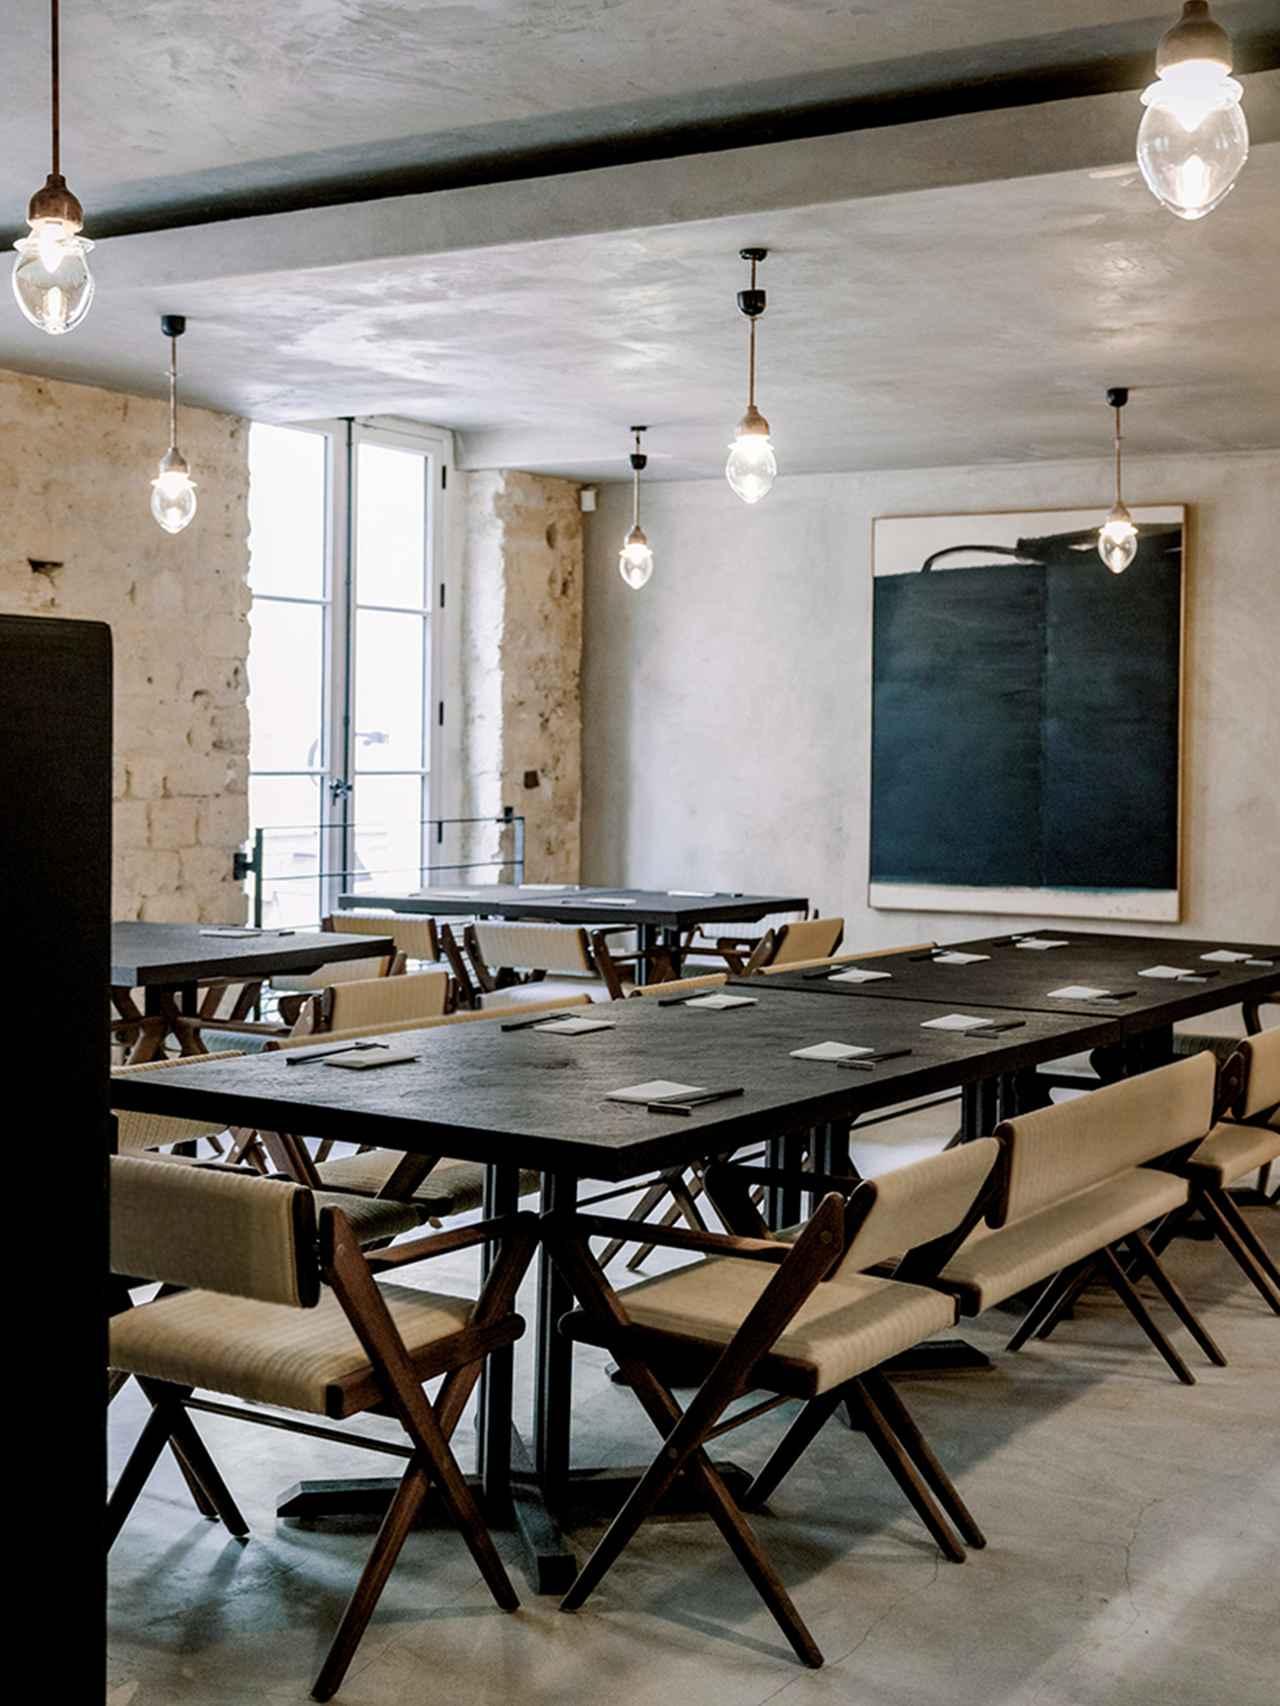 Images : 6番目の画像 - 「OGATA Paris ーー パリの空間に映る 日本の食とデザインの粋」のアルバム - T JAPAN:The New York Times Style Magazine 公式サイト